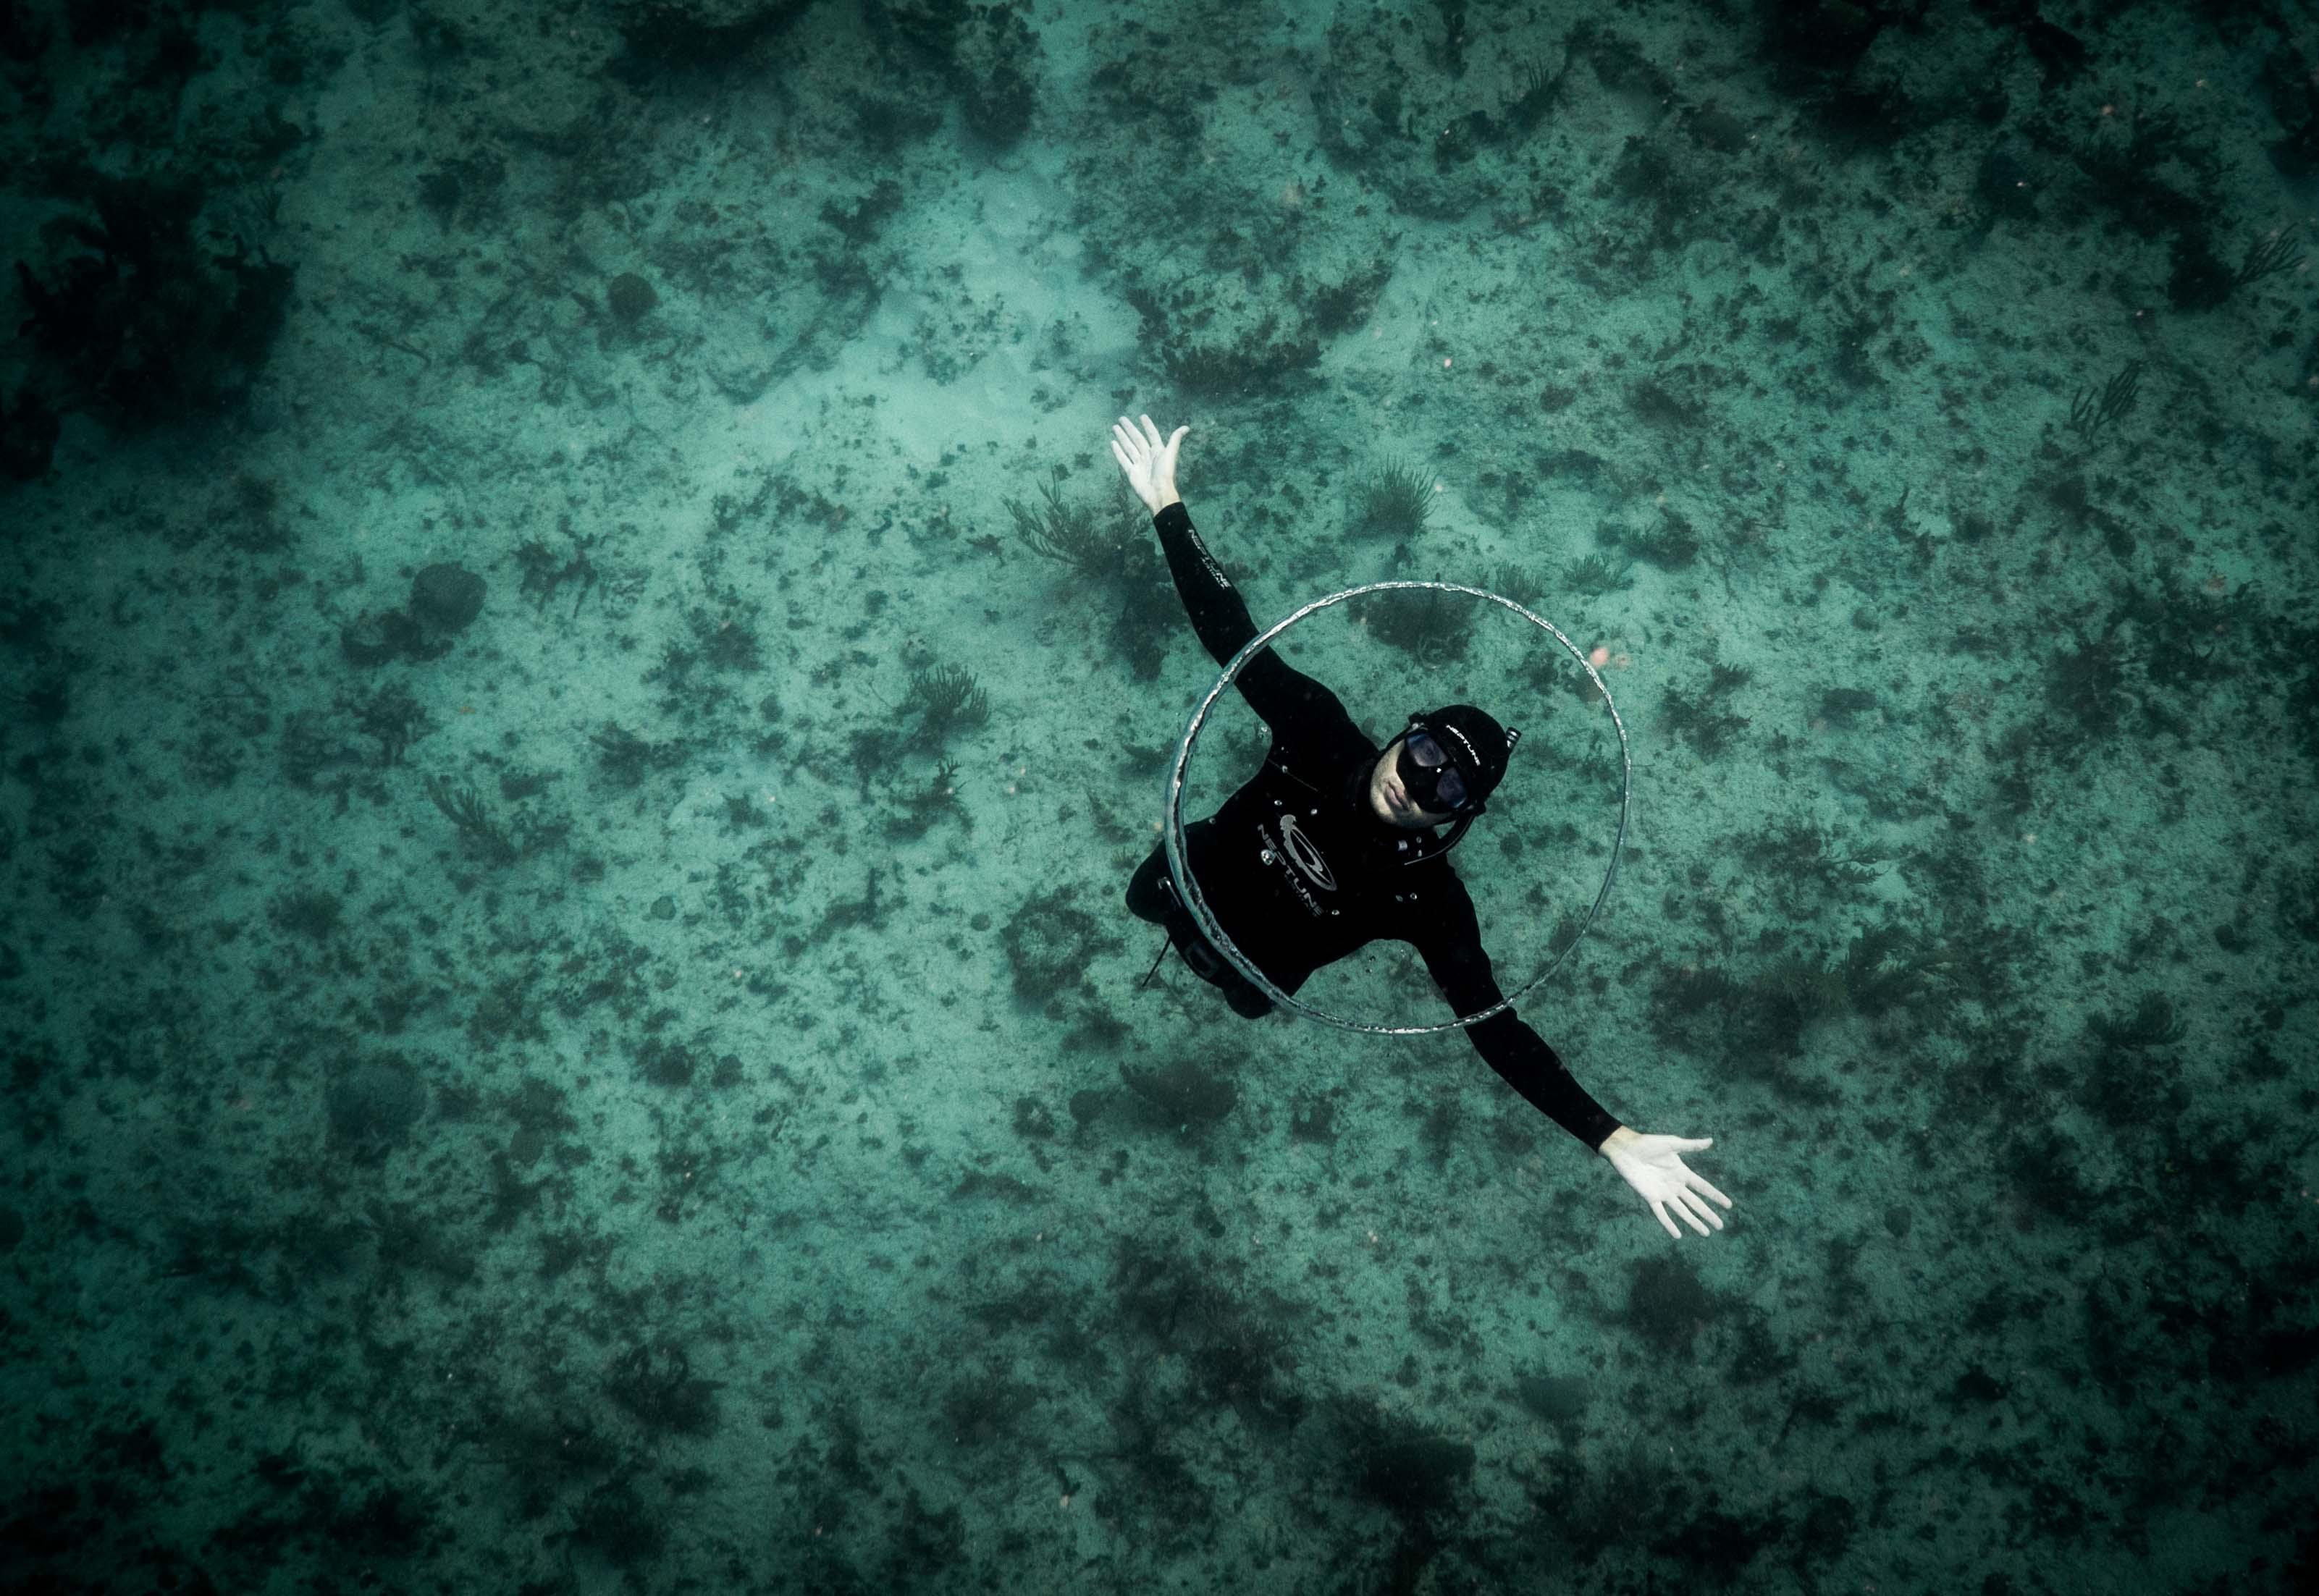 Baptême d'apnée sous-marine